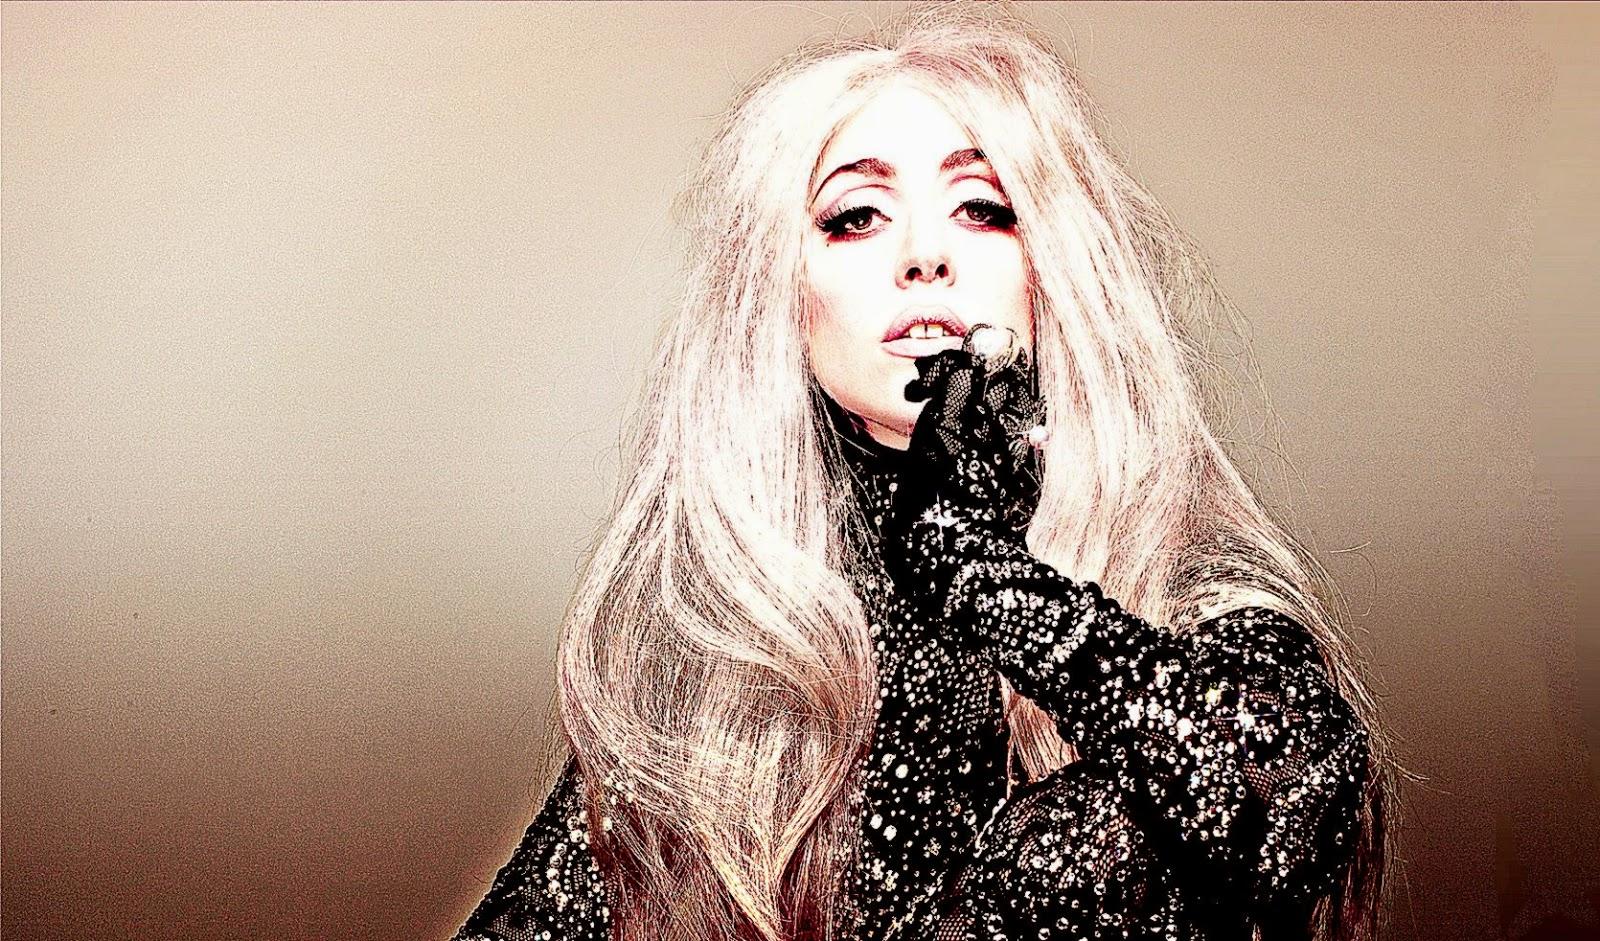 Lady Gaga 2014 HD Wallpapers   HD Wallpapers Inn